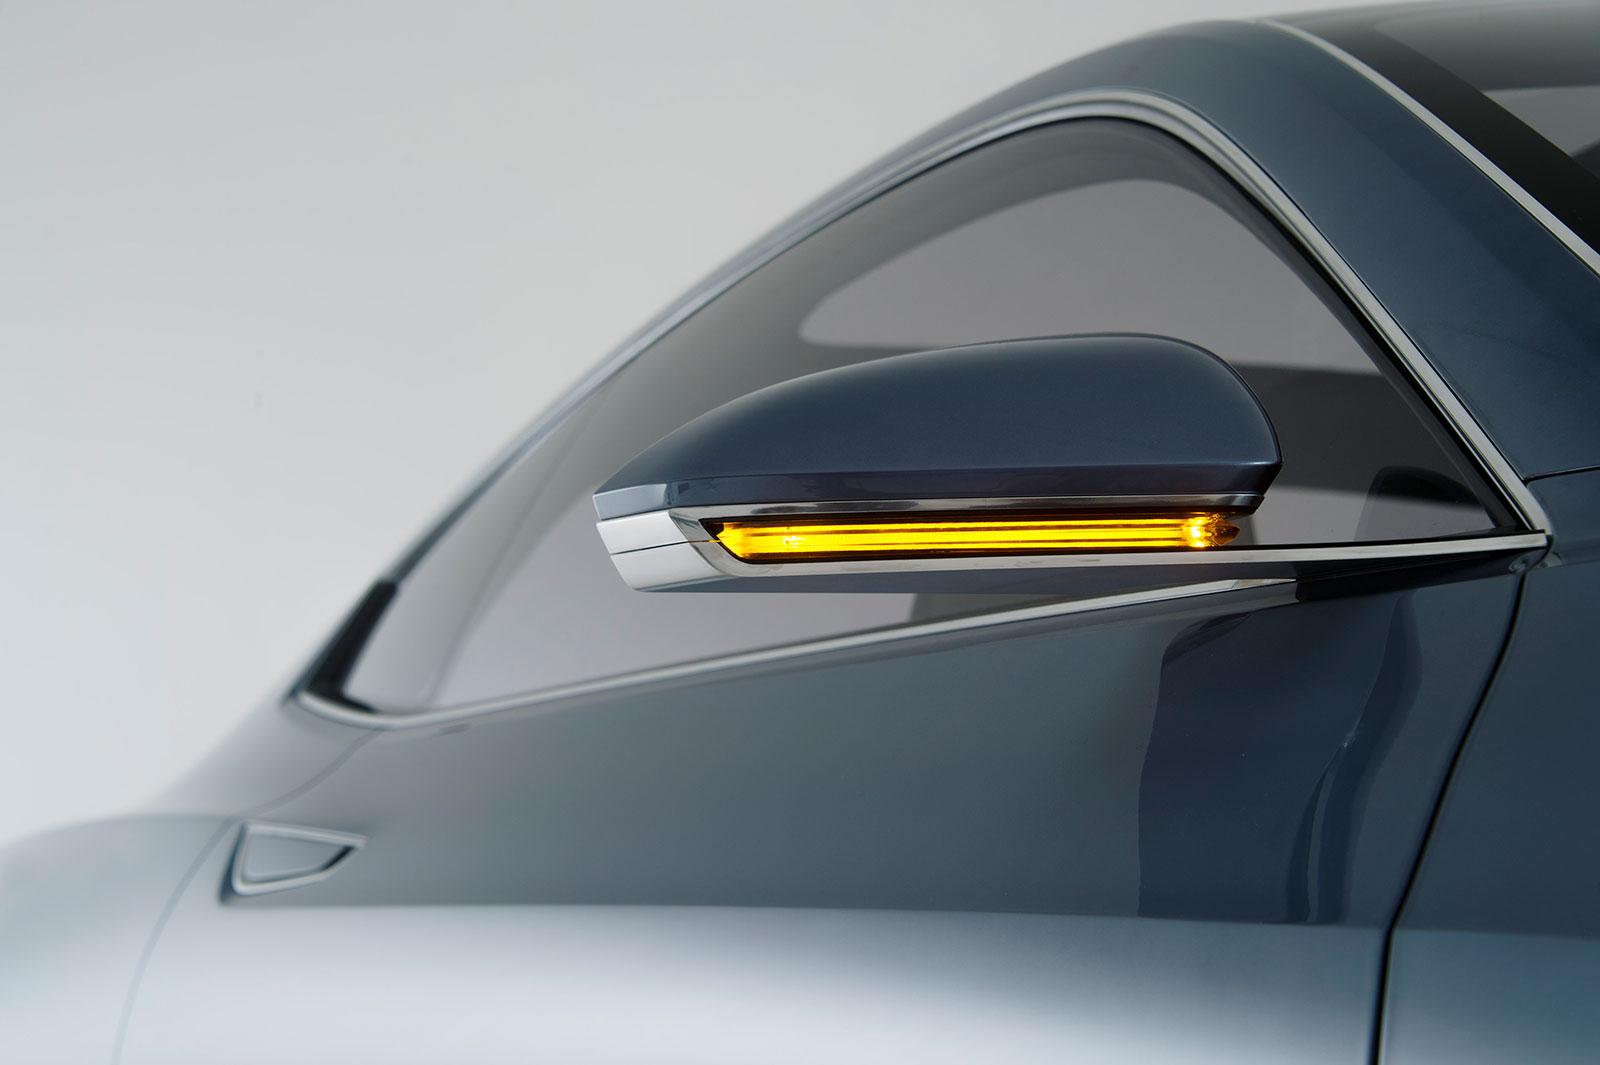 volvo concept coupe side mirror car body design. Black Bedroom Furniture Sets. Home Design Ideas